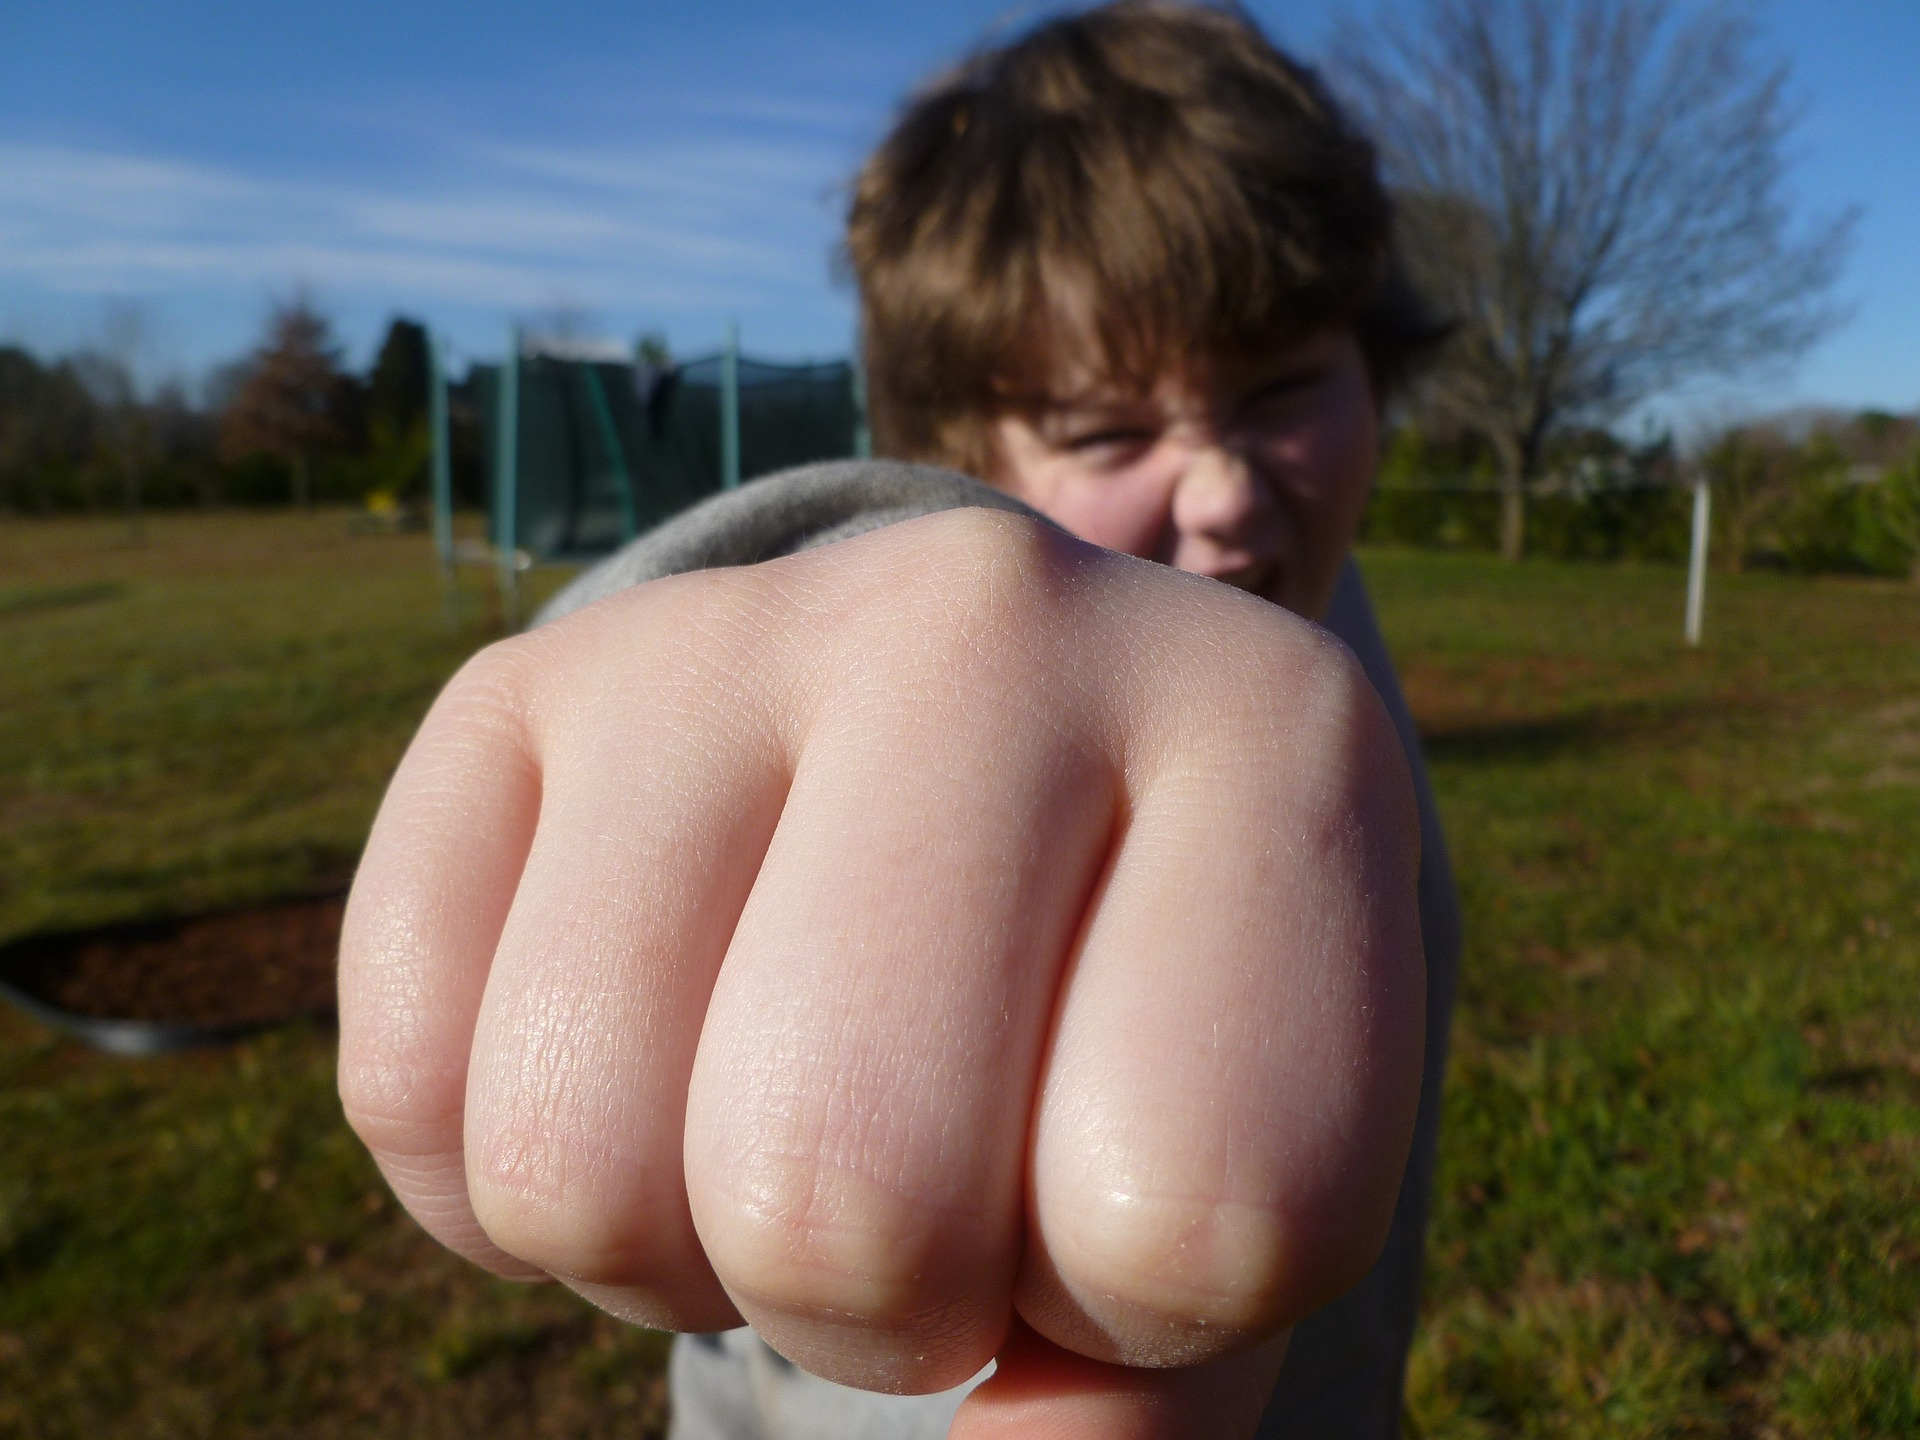 fist-bump-933916_1920.jpg